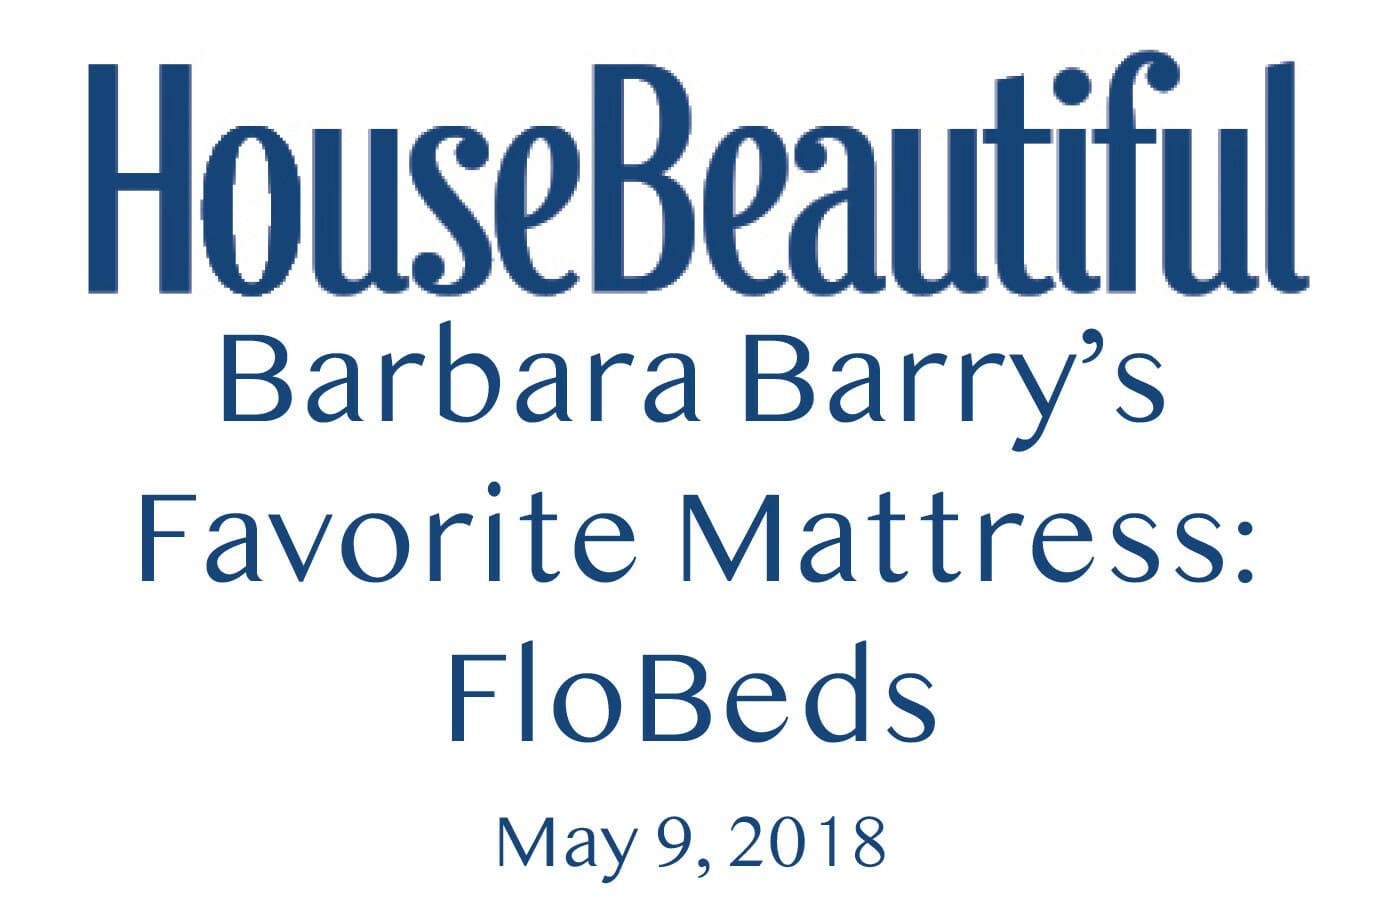 Barbara Barry - House Beautiful